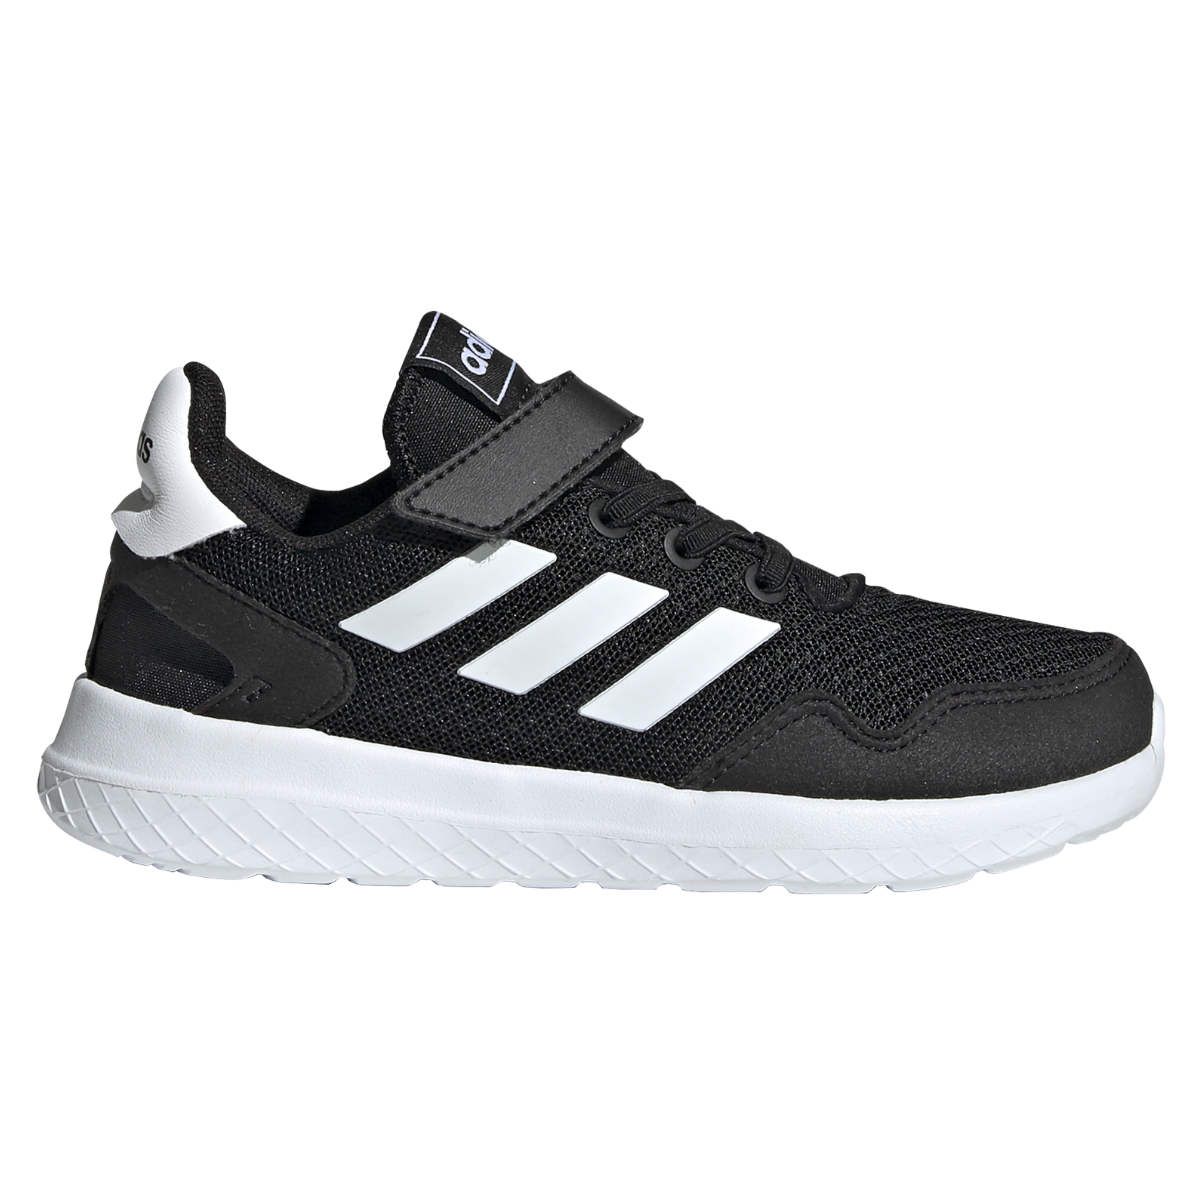 Adidas Predator Tango 19,3 Indendørs Sko Blå Junior